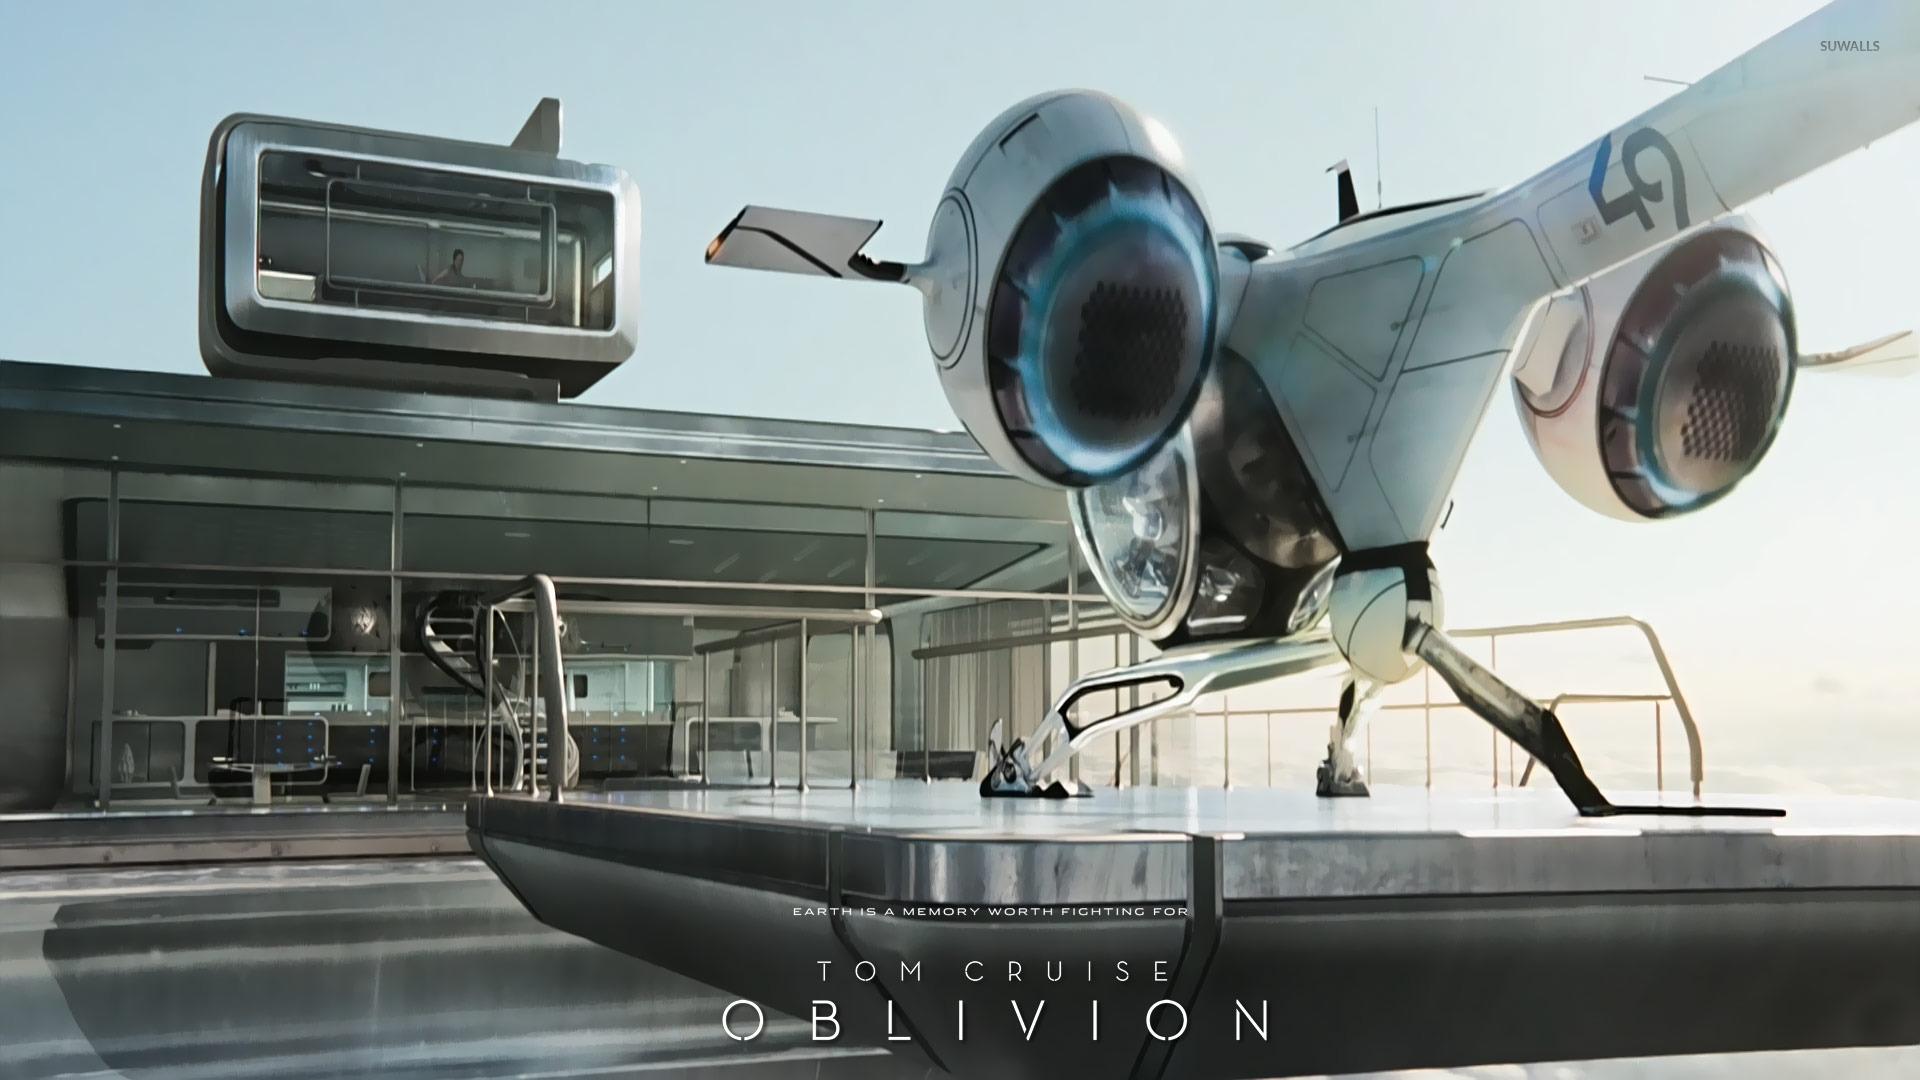 Oblivion wallpaper - Movie wallpapers